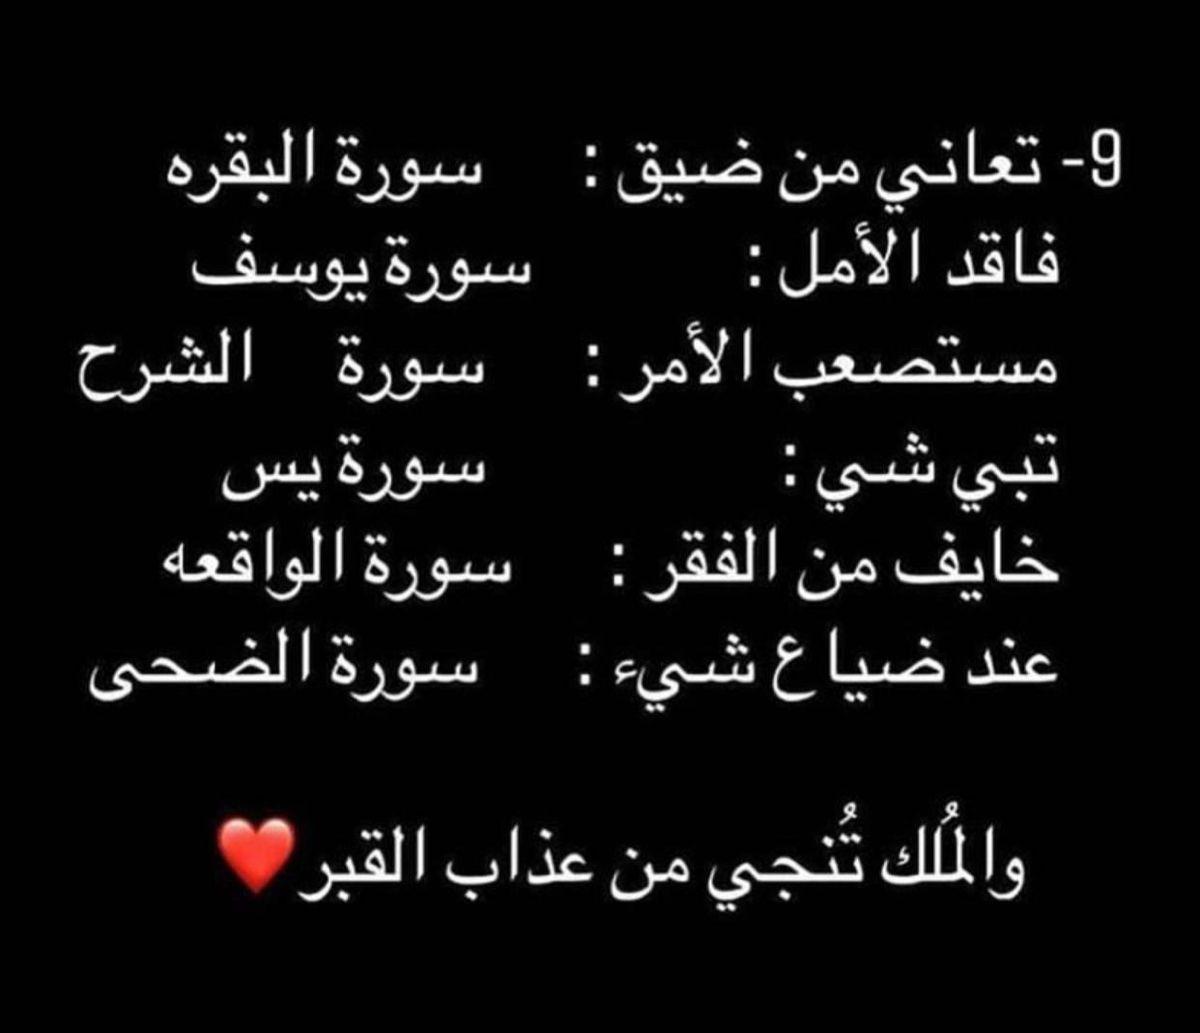 Pin By غيم On راحه ل قلبك Islamic Quotes Islamic Quotes Quran Quran Quotes